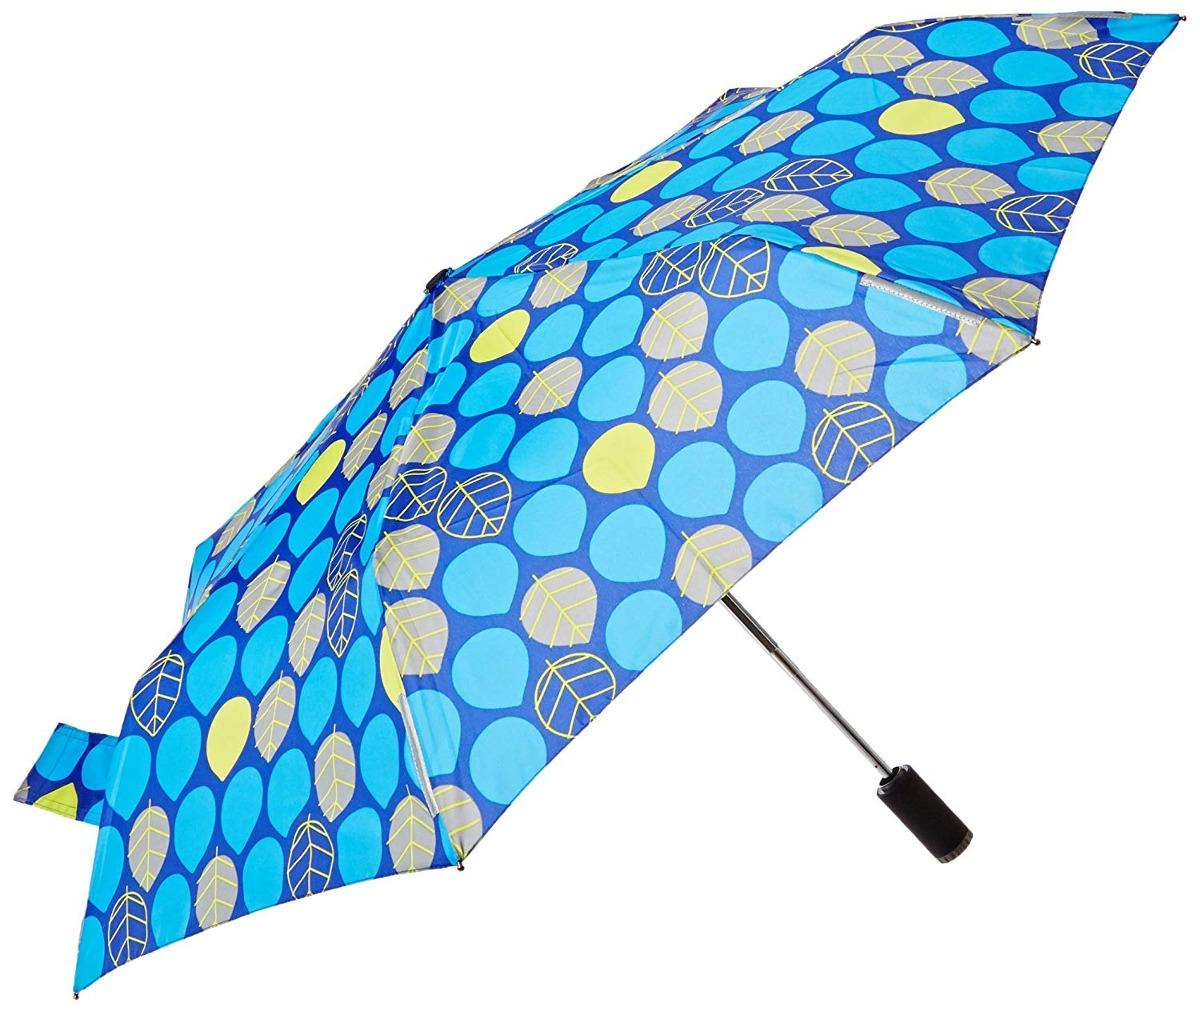 paraguas avion equipaje de mano ryanair